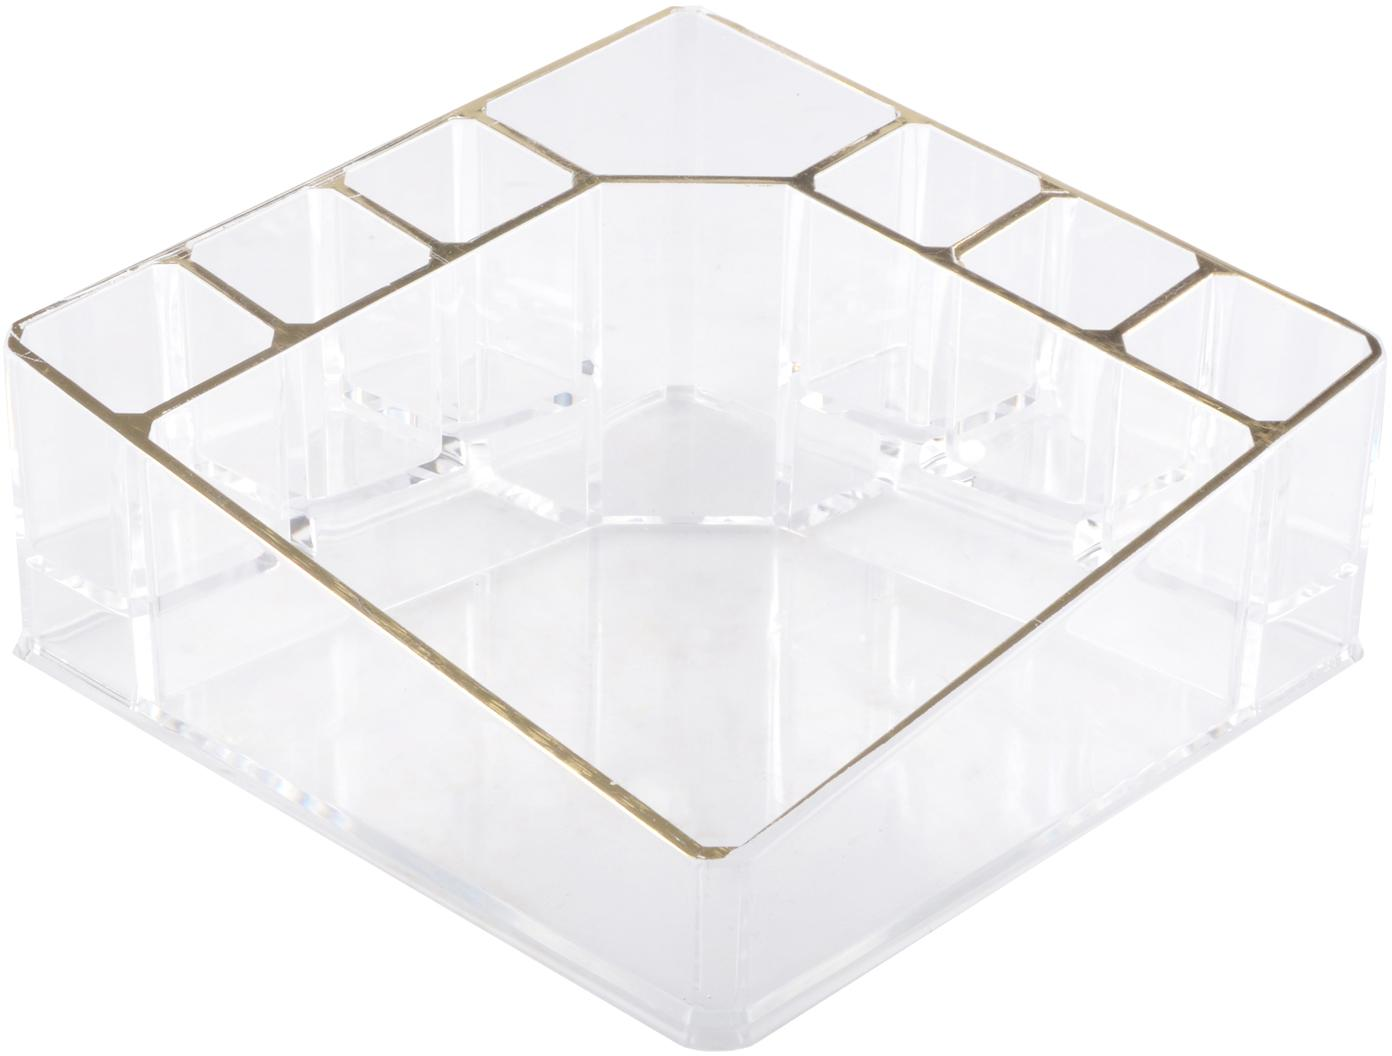 Kosmetik-Organizer Malla, Kunststoff, Transparent, Goldfarben, 14 x 7 cm